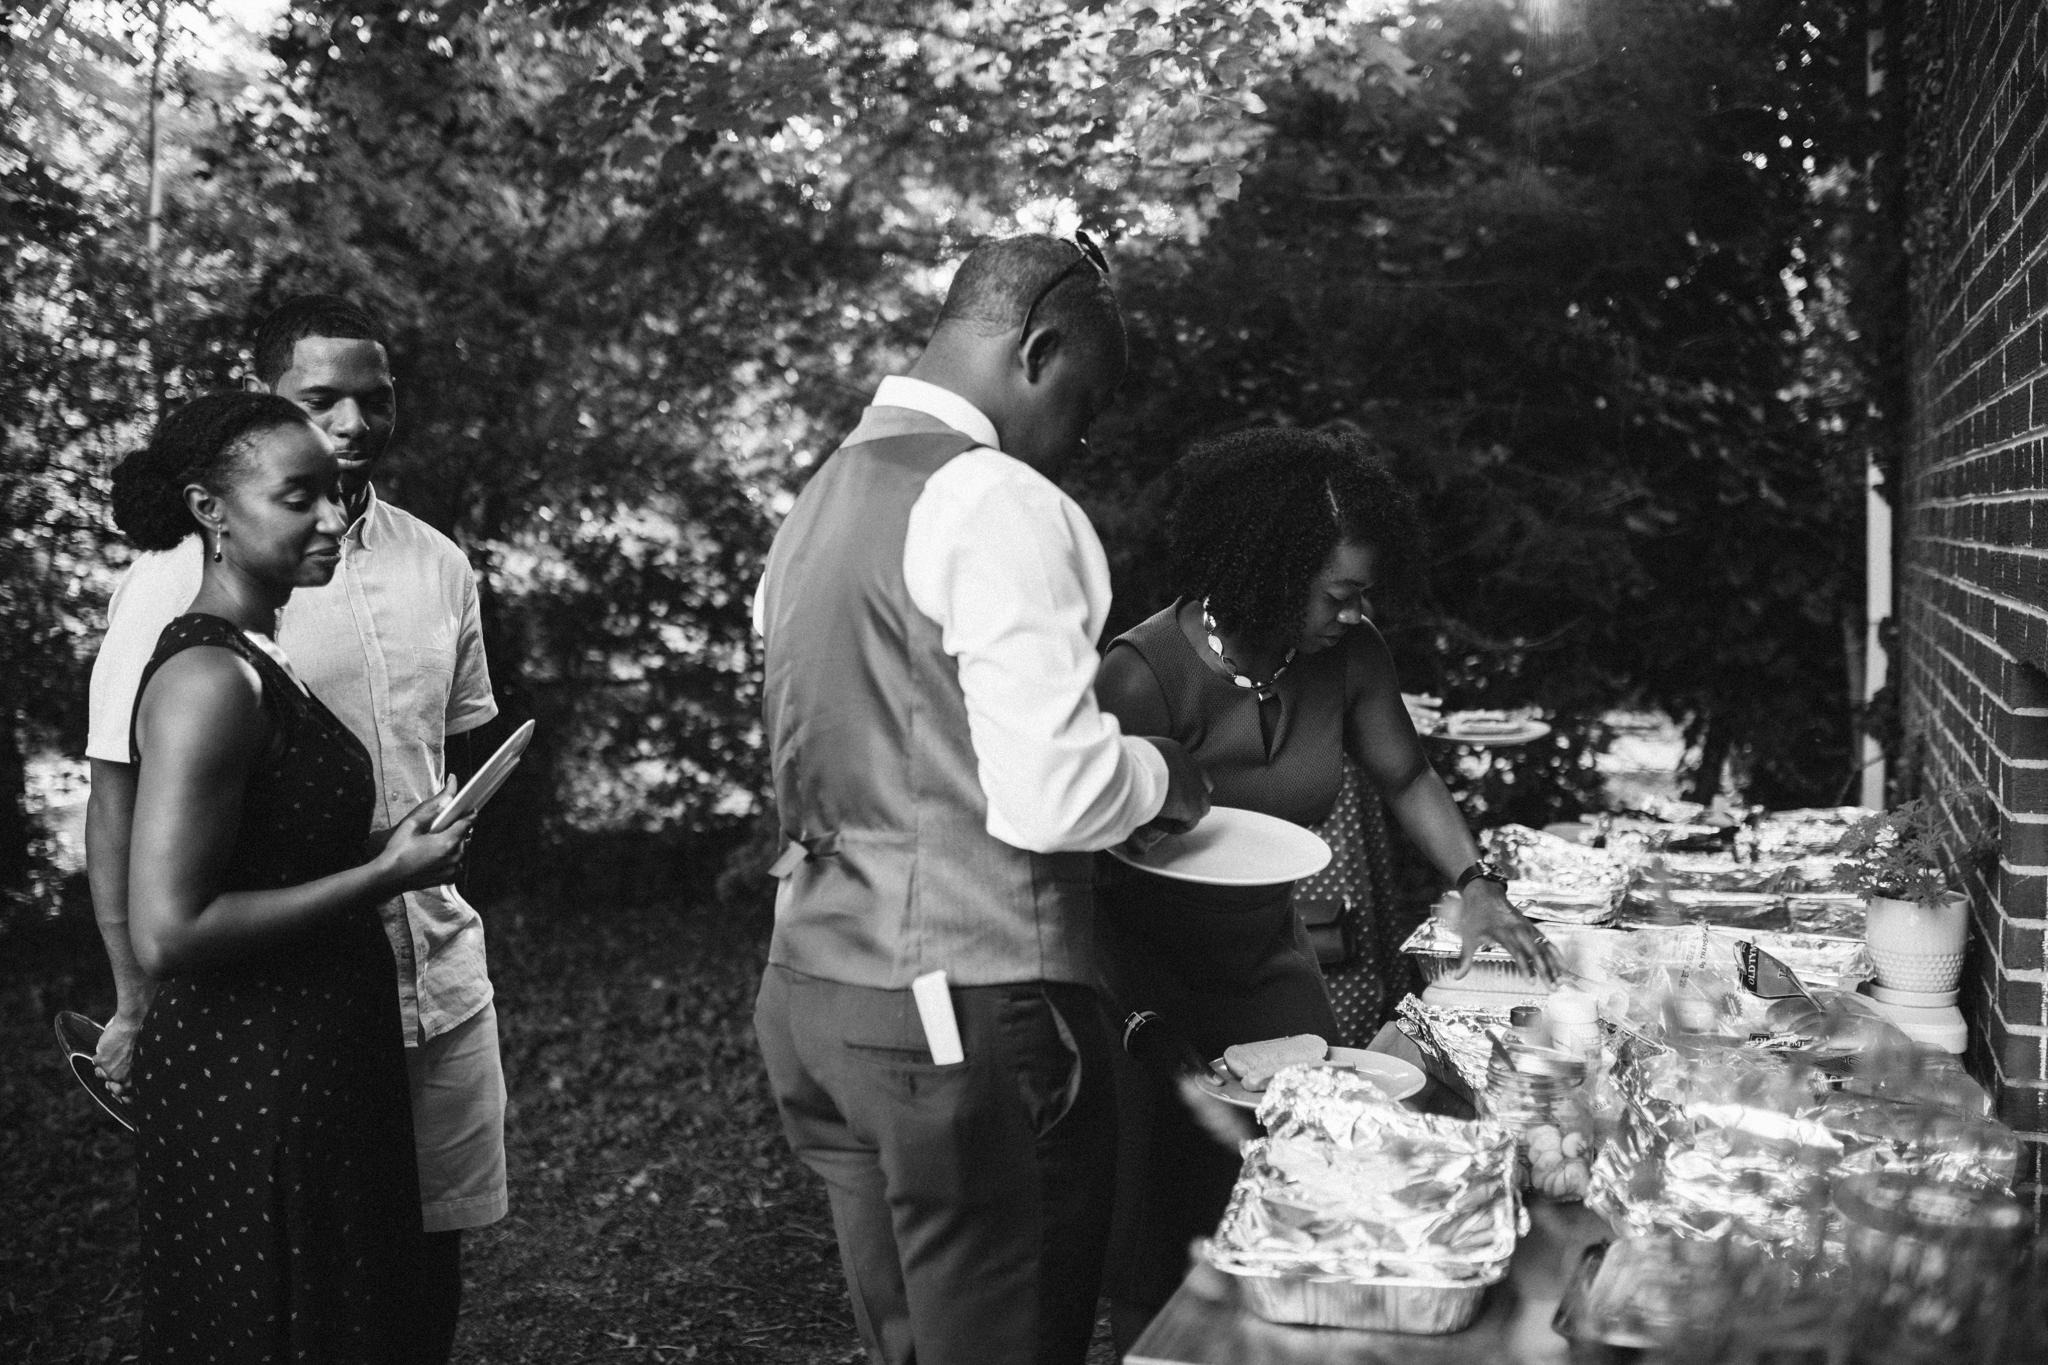 dorota_dwight_richmond_backyard_wedding-64.jpg